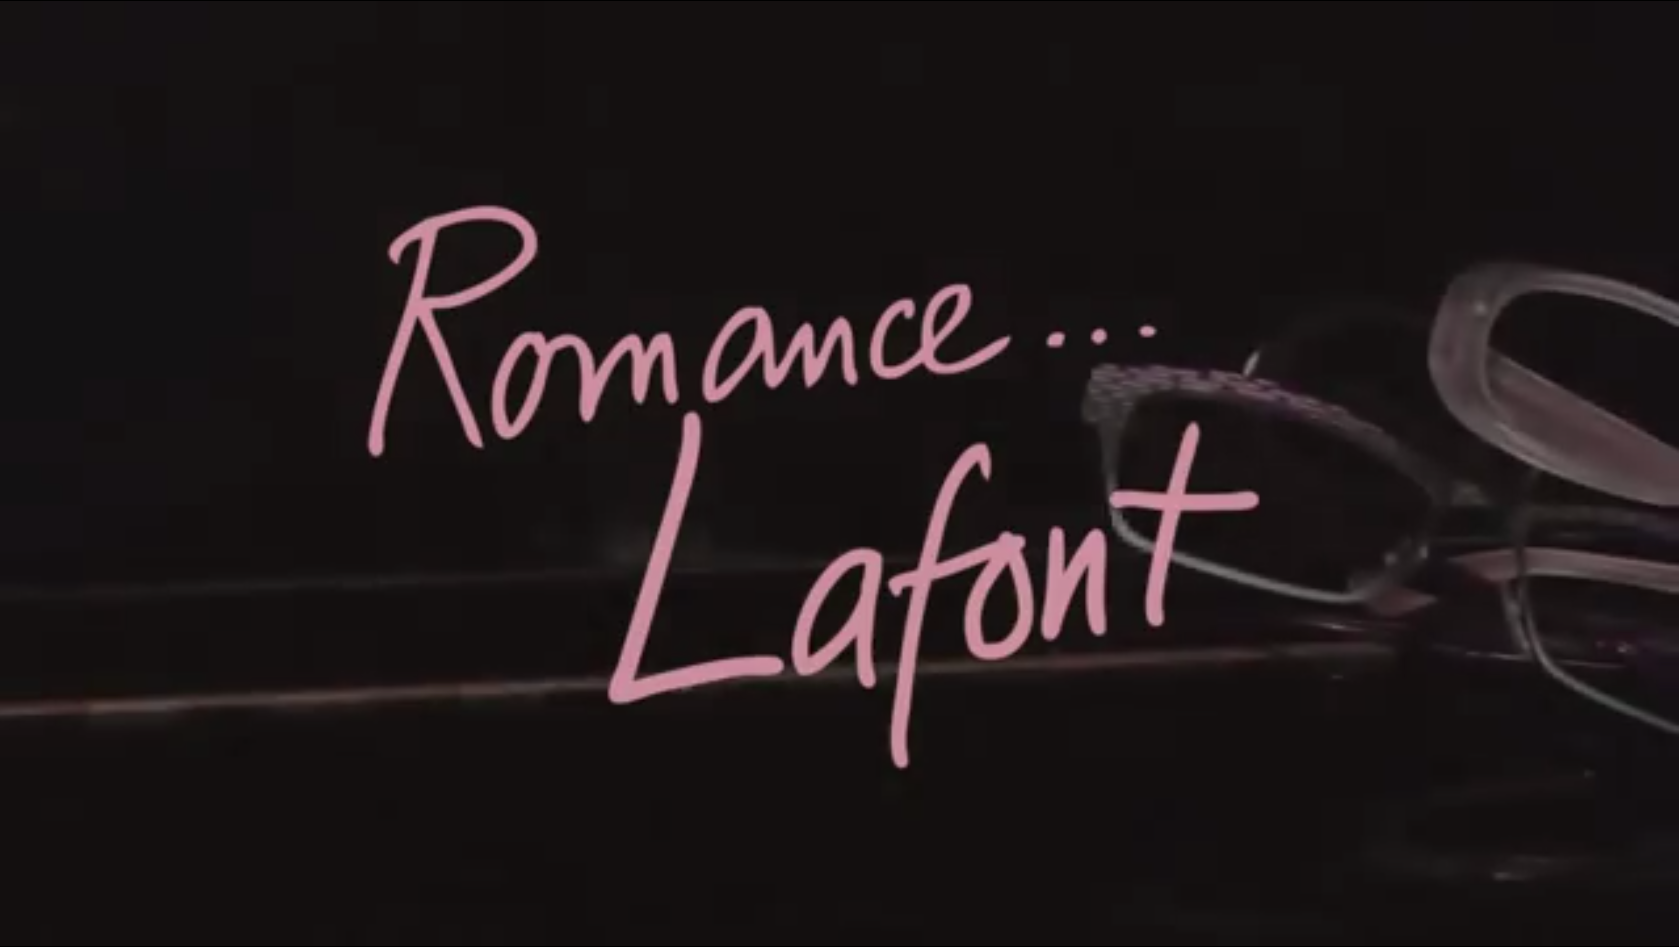 Jean lafont eyeglasses frames - Optical Illusion Del Mar Lafont Romance 2014 Lafont S Spring Summer Women S Eyewear